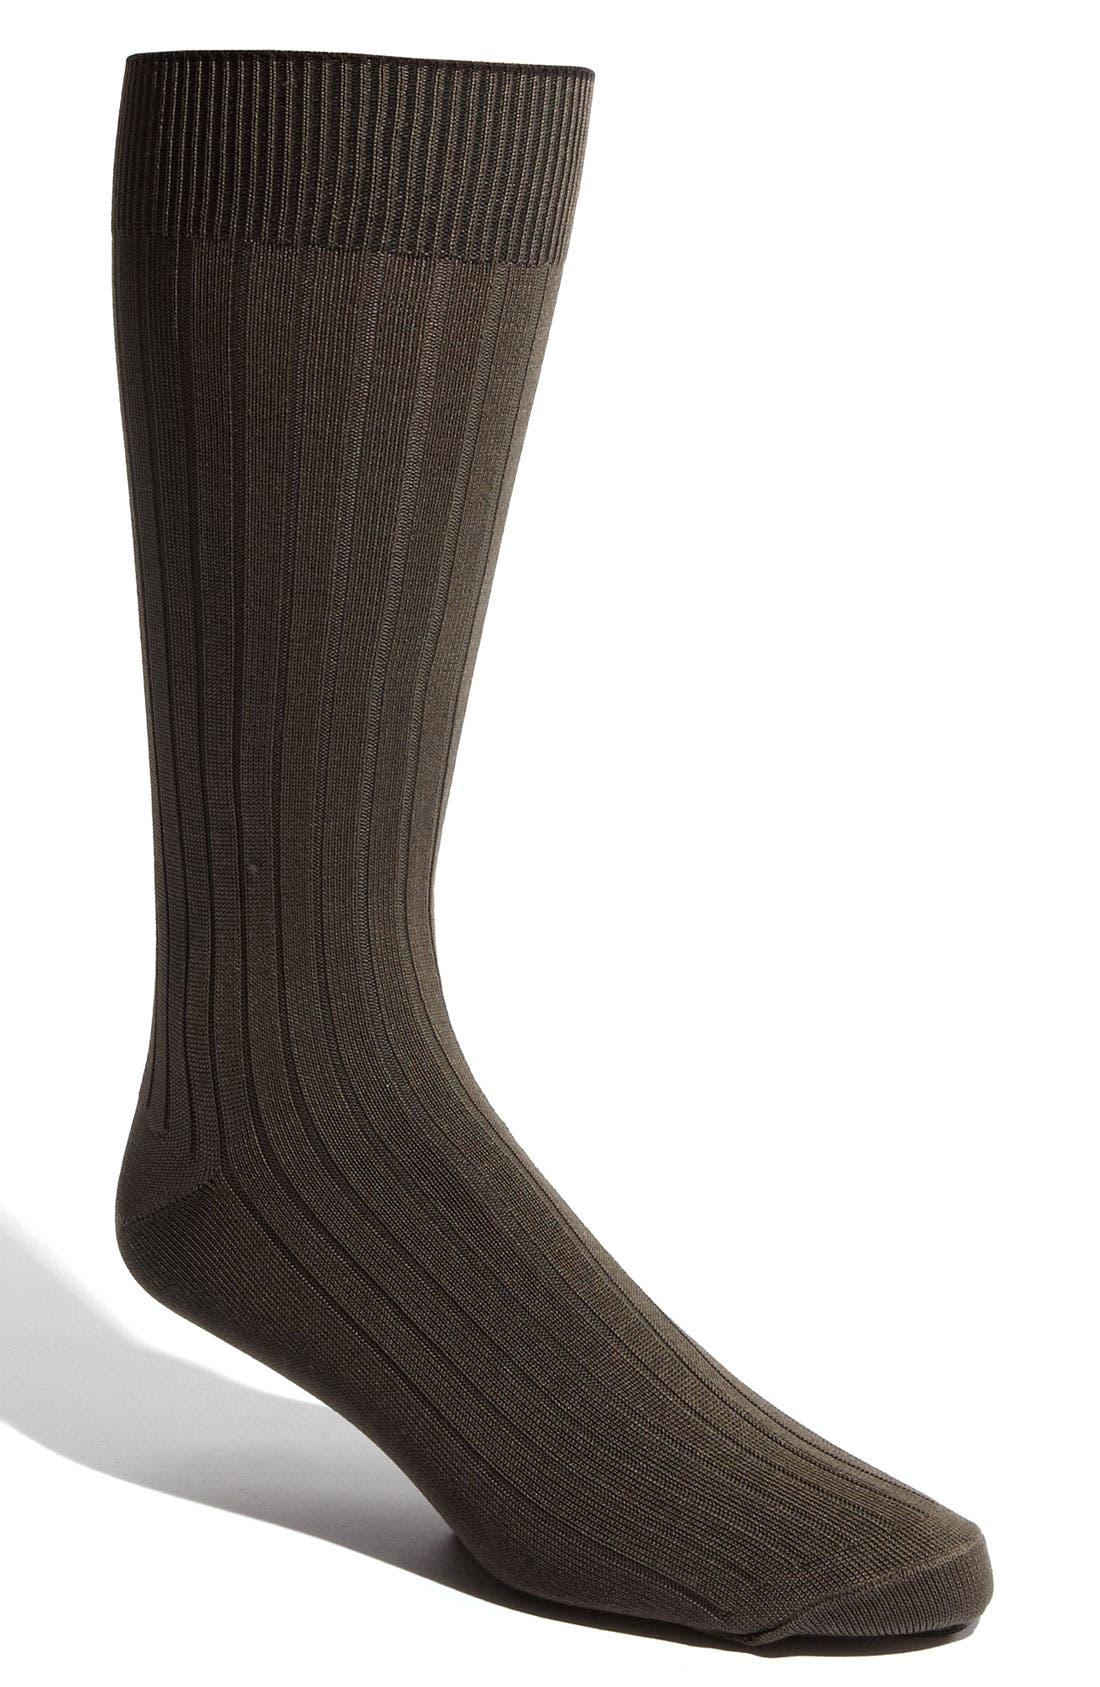 Cotton Blend Socks,                             Main thumbnail 1, color,                             Olive